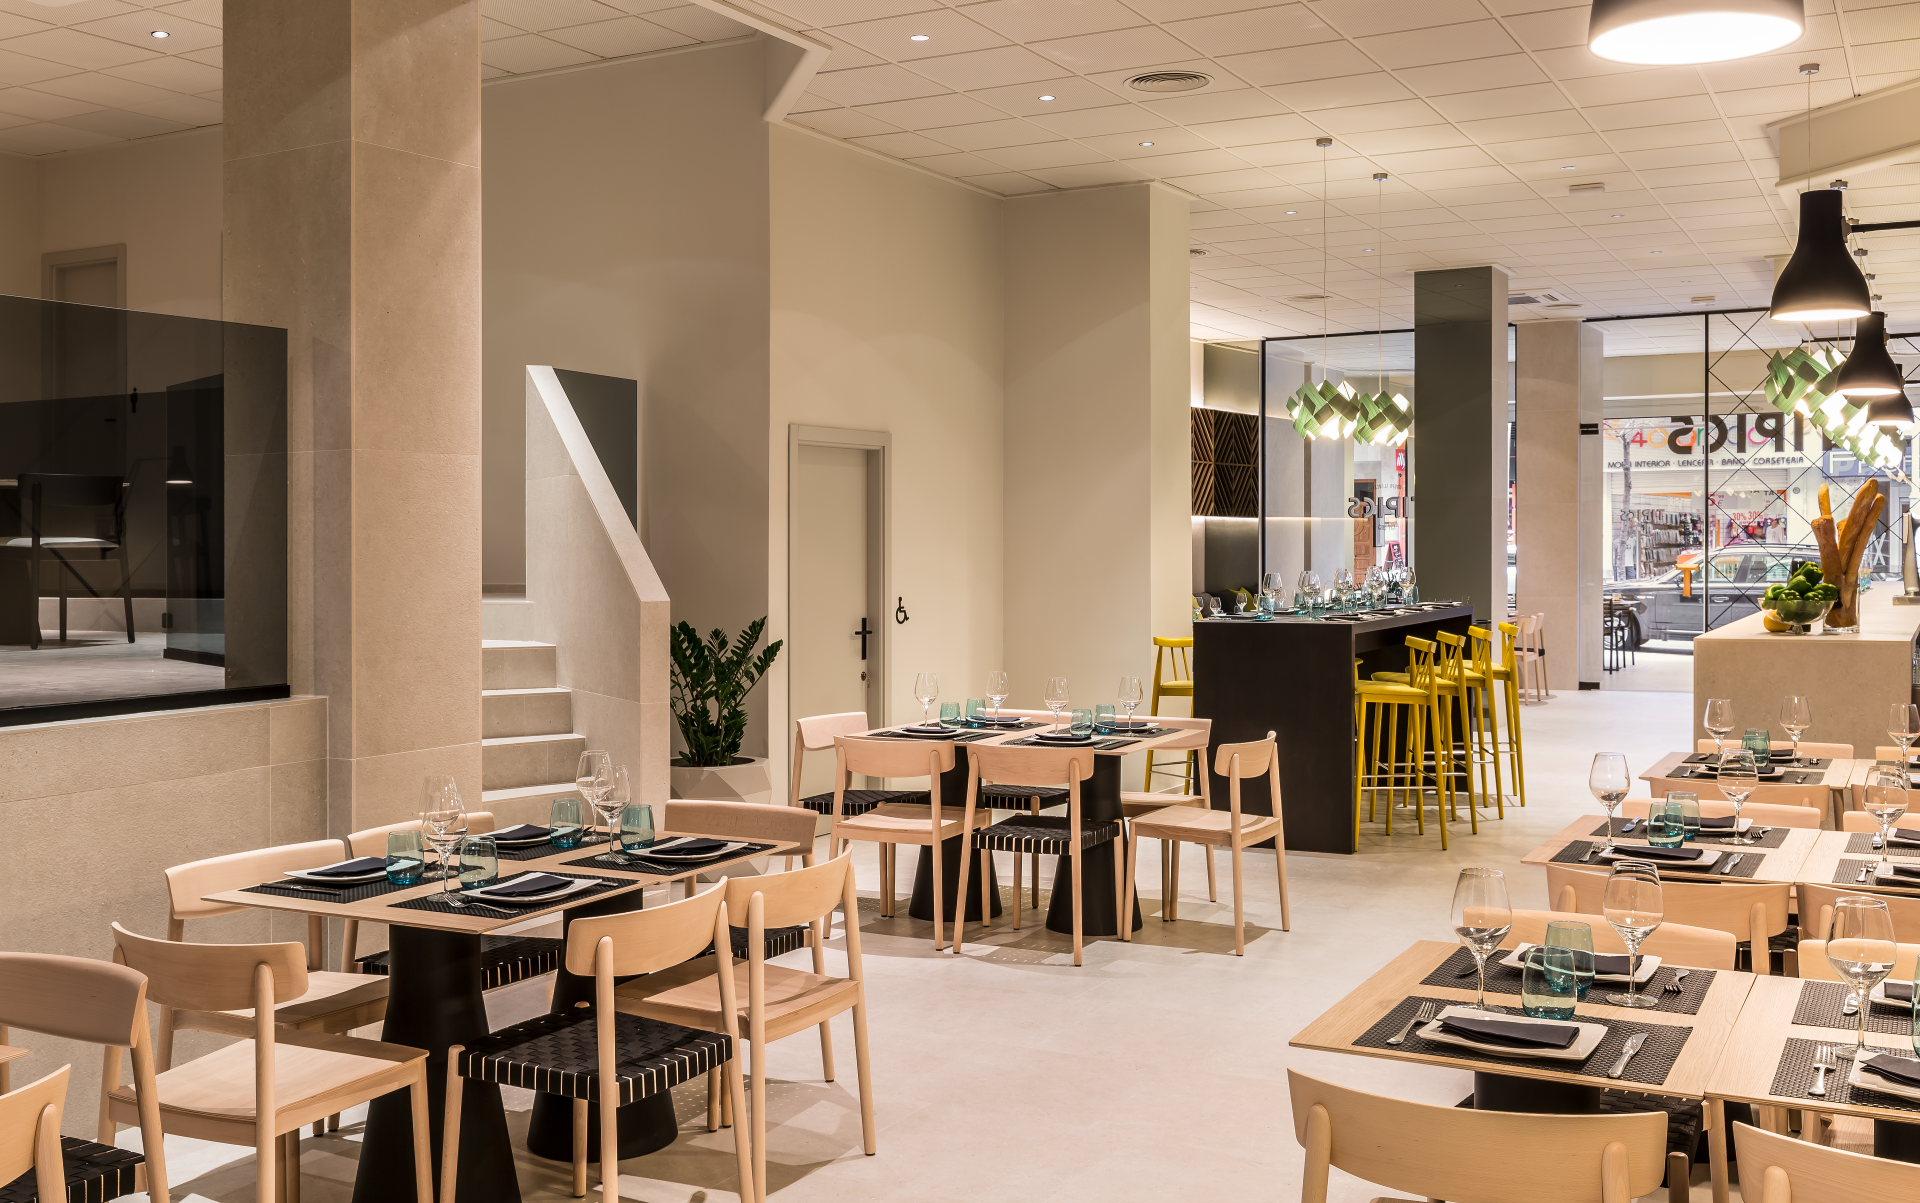 fotografia-arquitectura–interiorismo-valencia-german-cabo-estudihac-restaurante-tipics-xativa (24)